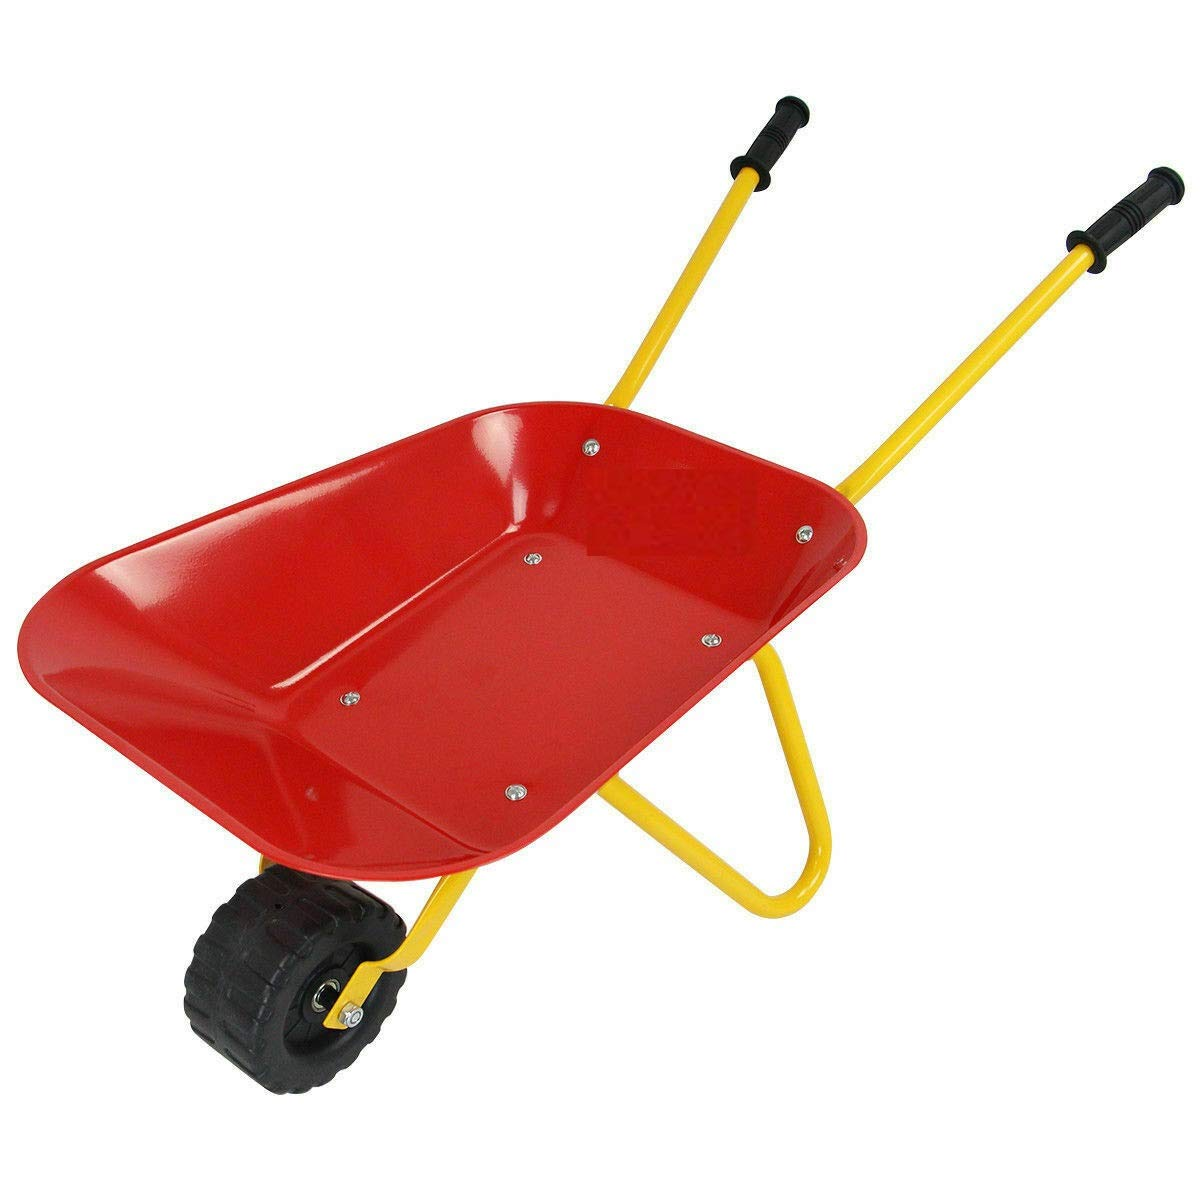 Heize best price Red Kids Metal Wheelbarrow Children's Size Outdoor Garden Backyard Play Toy by Heize best price (Image #7)